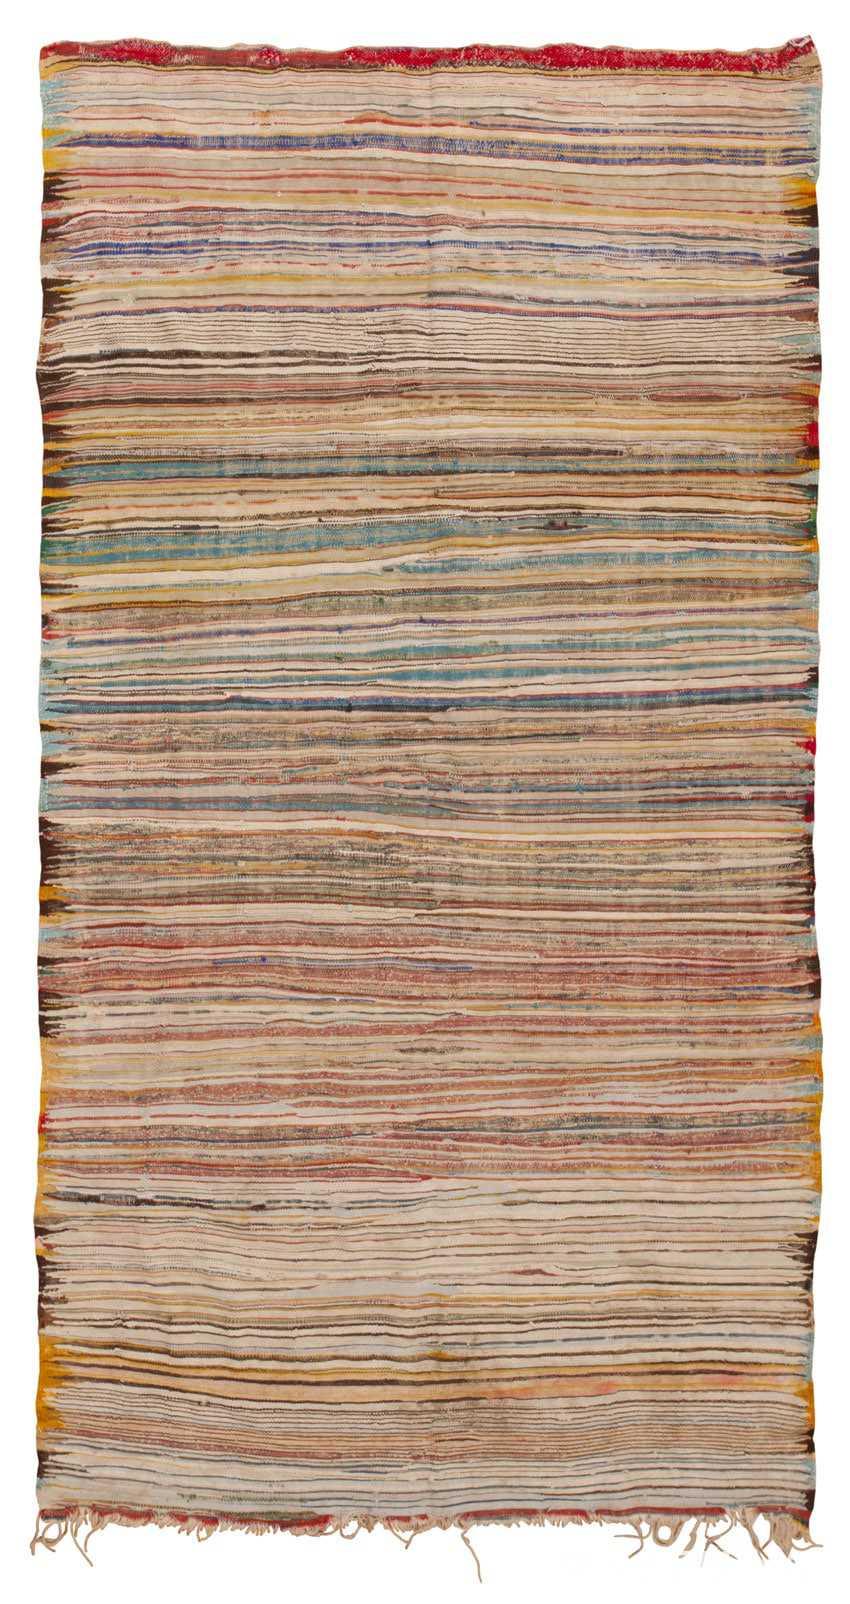 Vintage Moroccan Carpet 45450 Detail/Large View